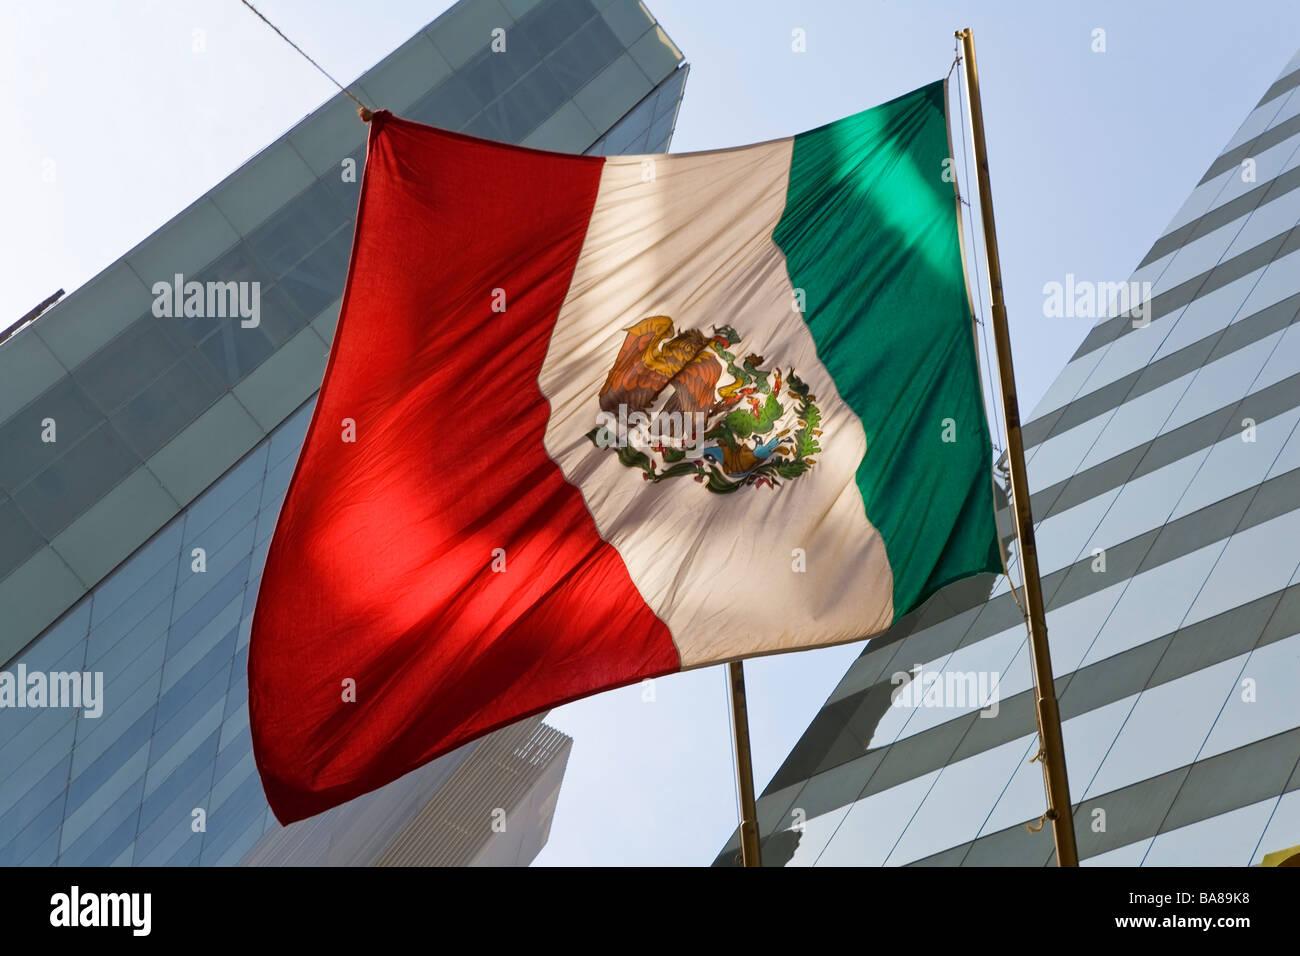 Mexikanische Flagge Finanzviertel Mexiko Stockfoto